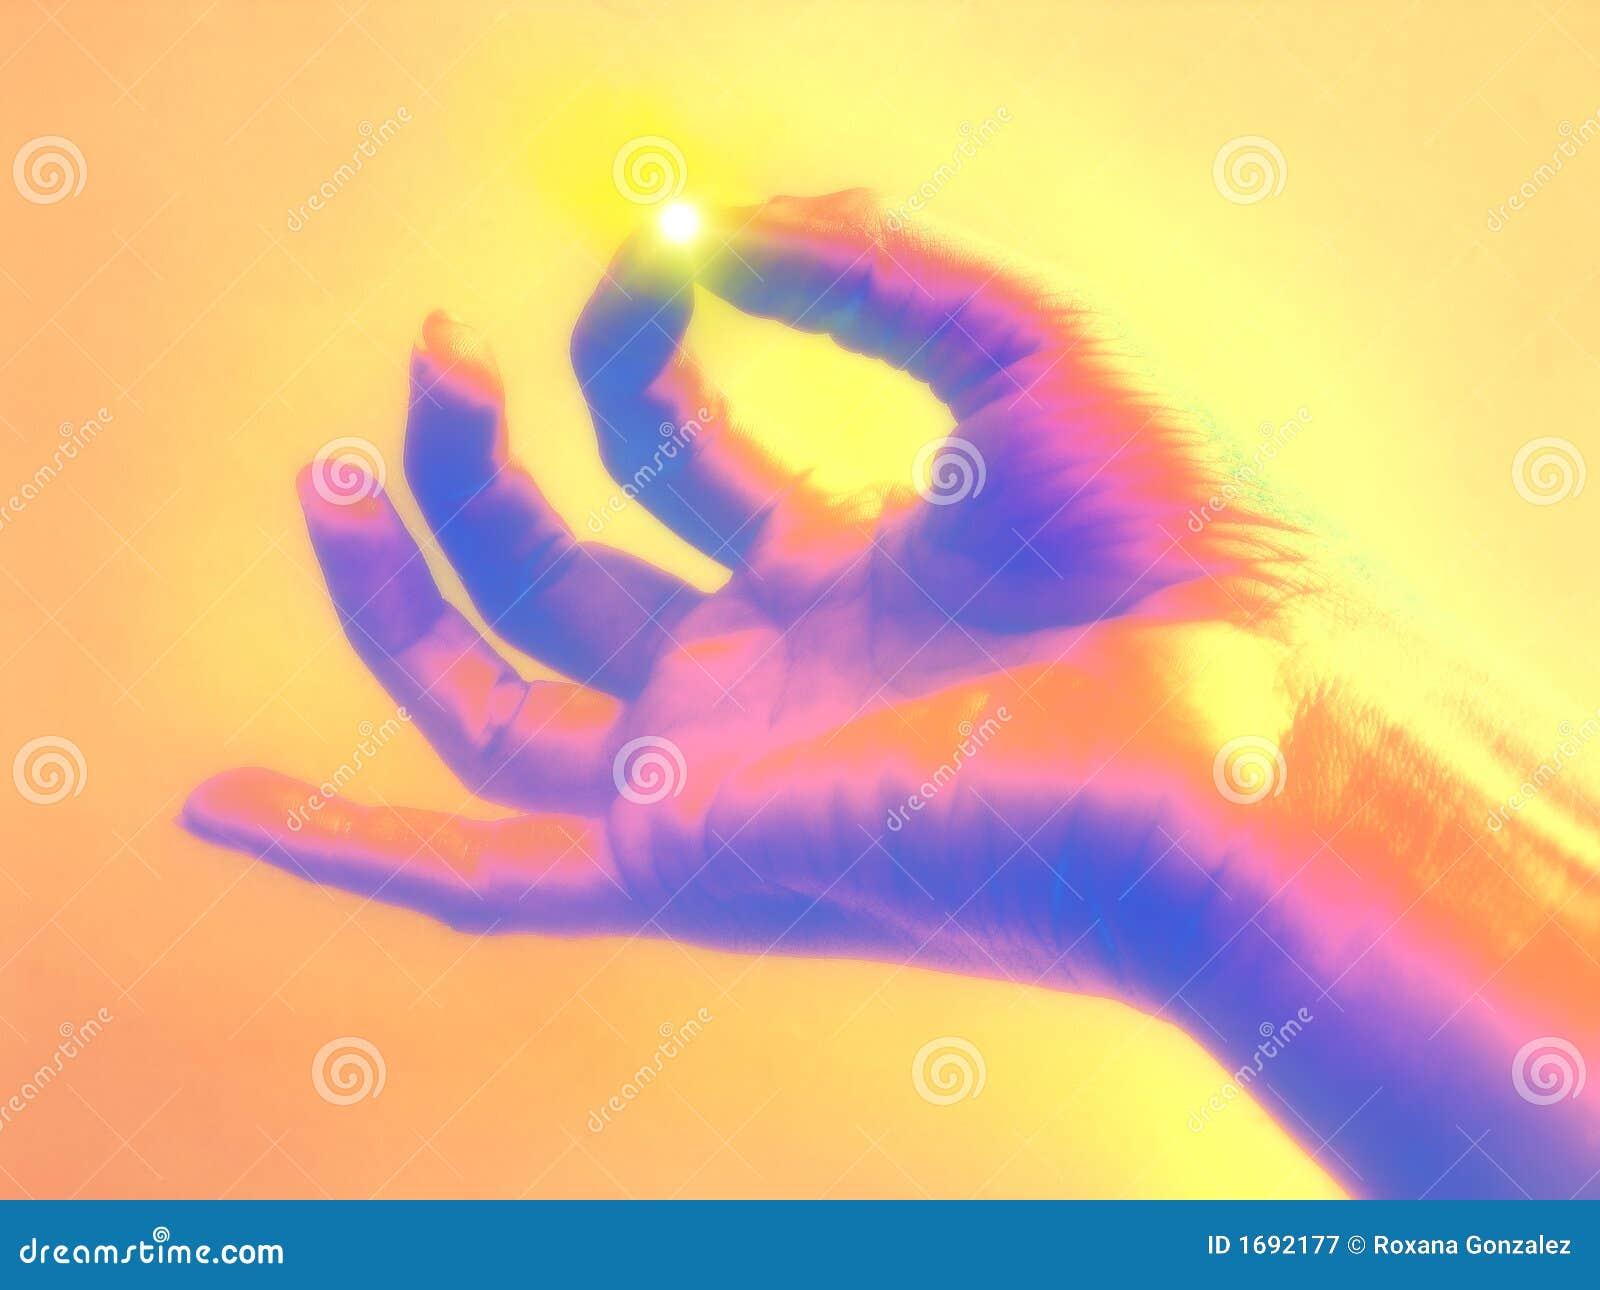 Enlightone: Enlightenment Concept Stock Image